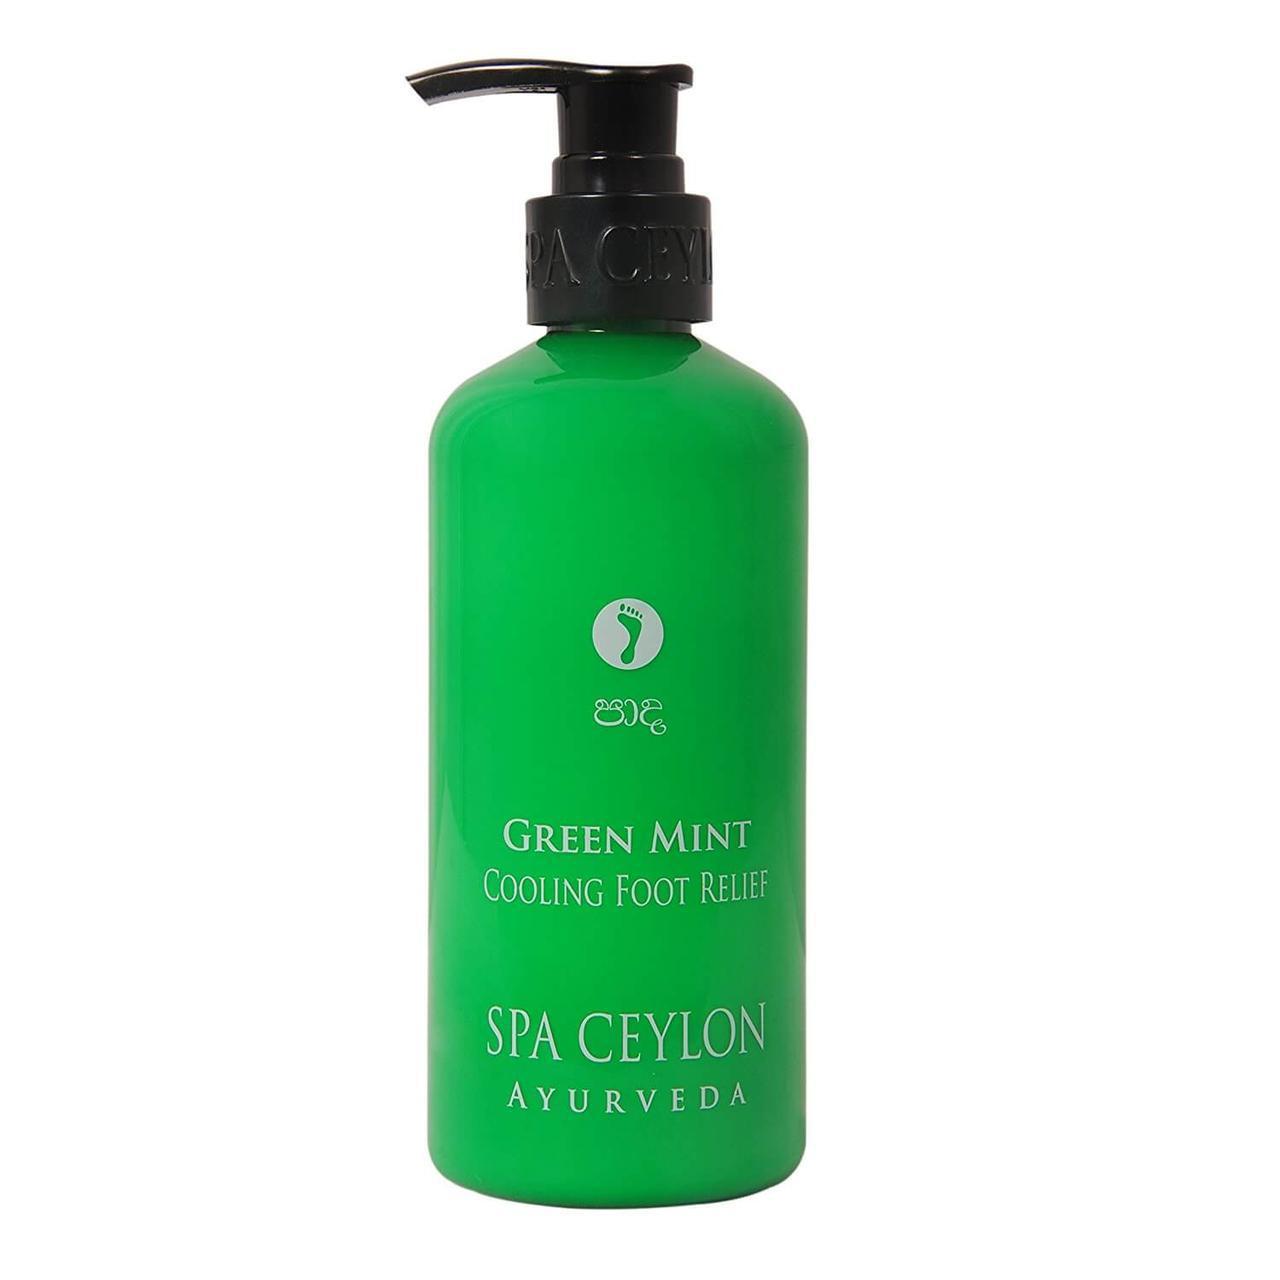 Охлаждающий бальзам для ног Зеленая Мята (Green Mint Cooling Foot Relief, Spa Ceylon), 300 мл